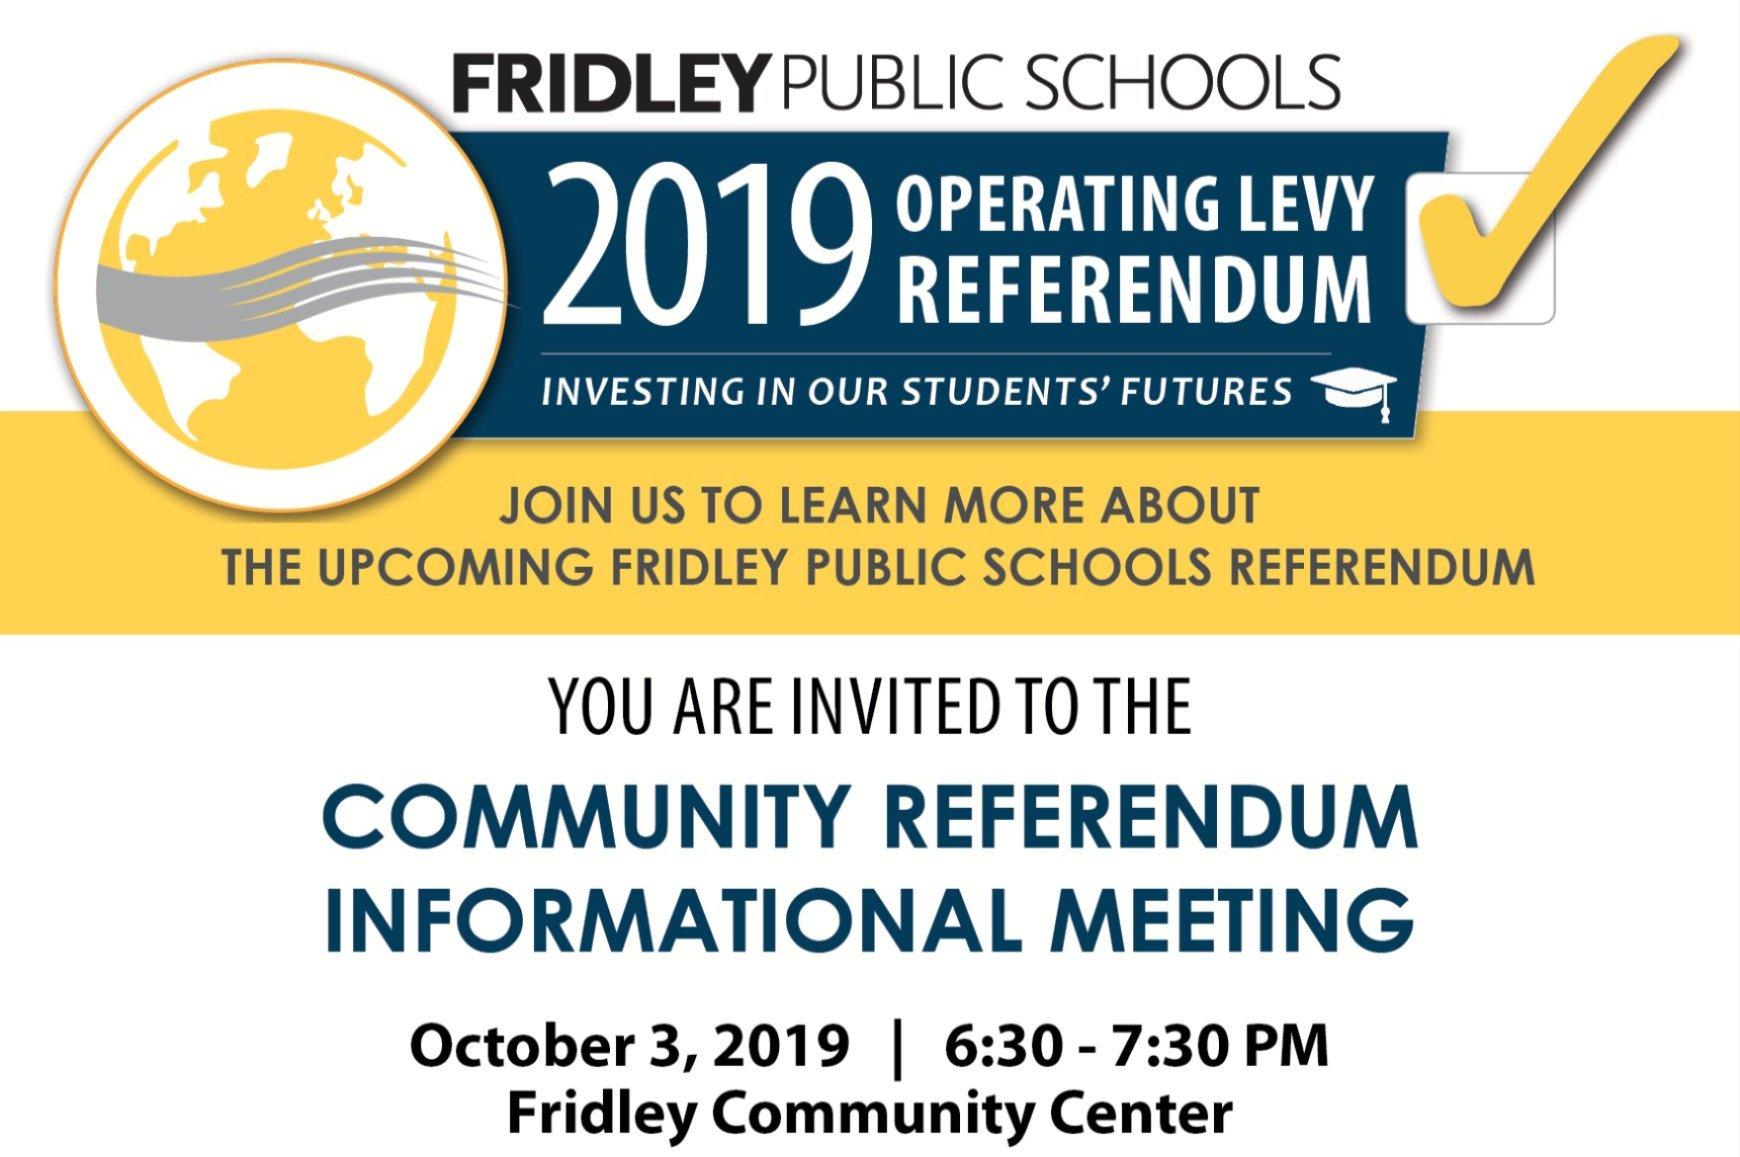 Community Referendum Informational Meeting